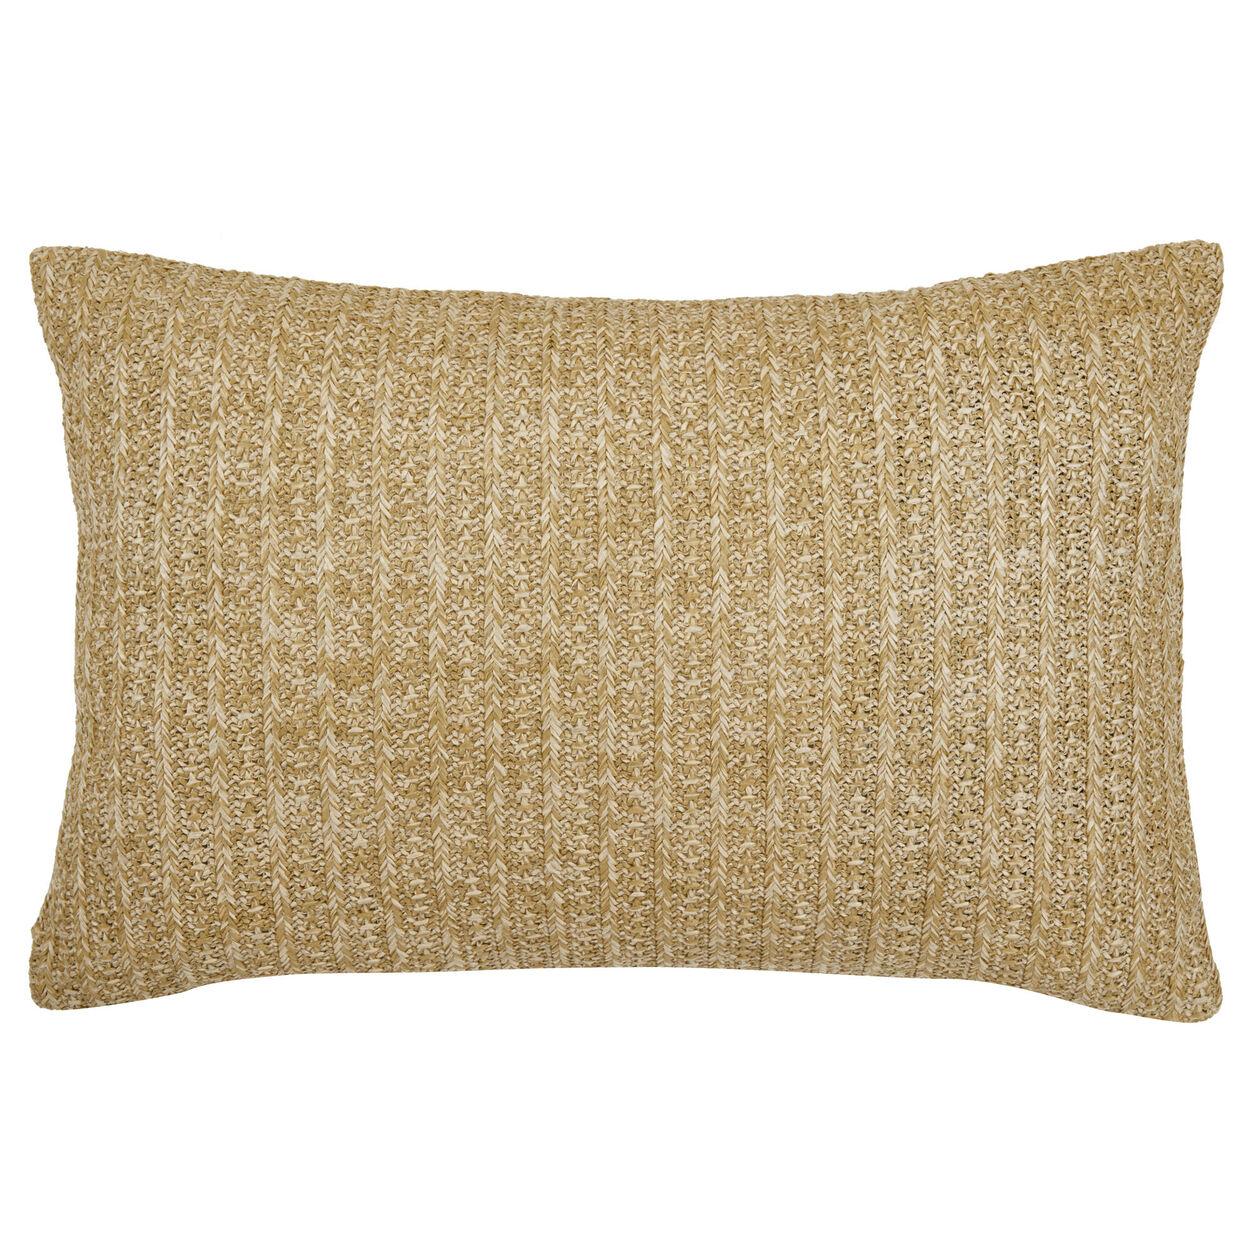 "Straw Water-Repellent Decorative Lumbar Pillow 15"" X 24"""